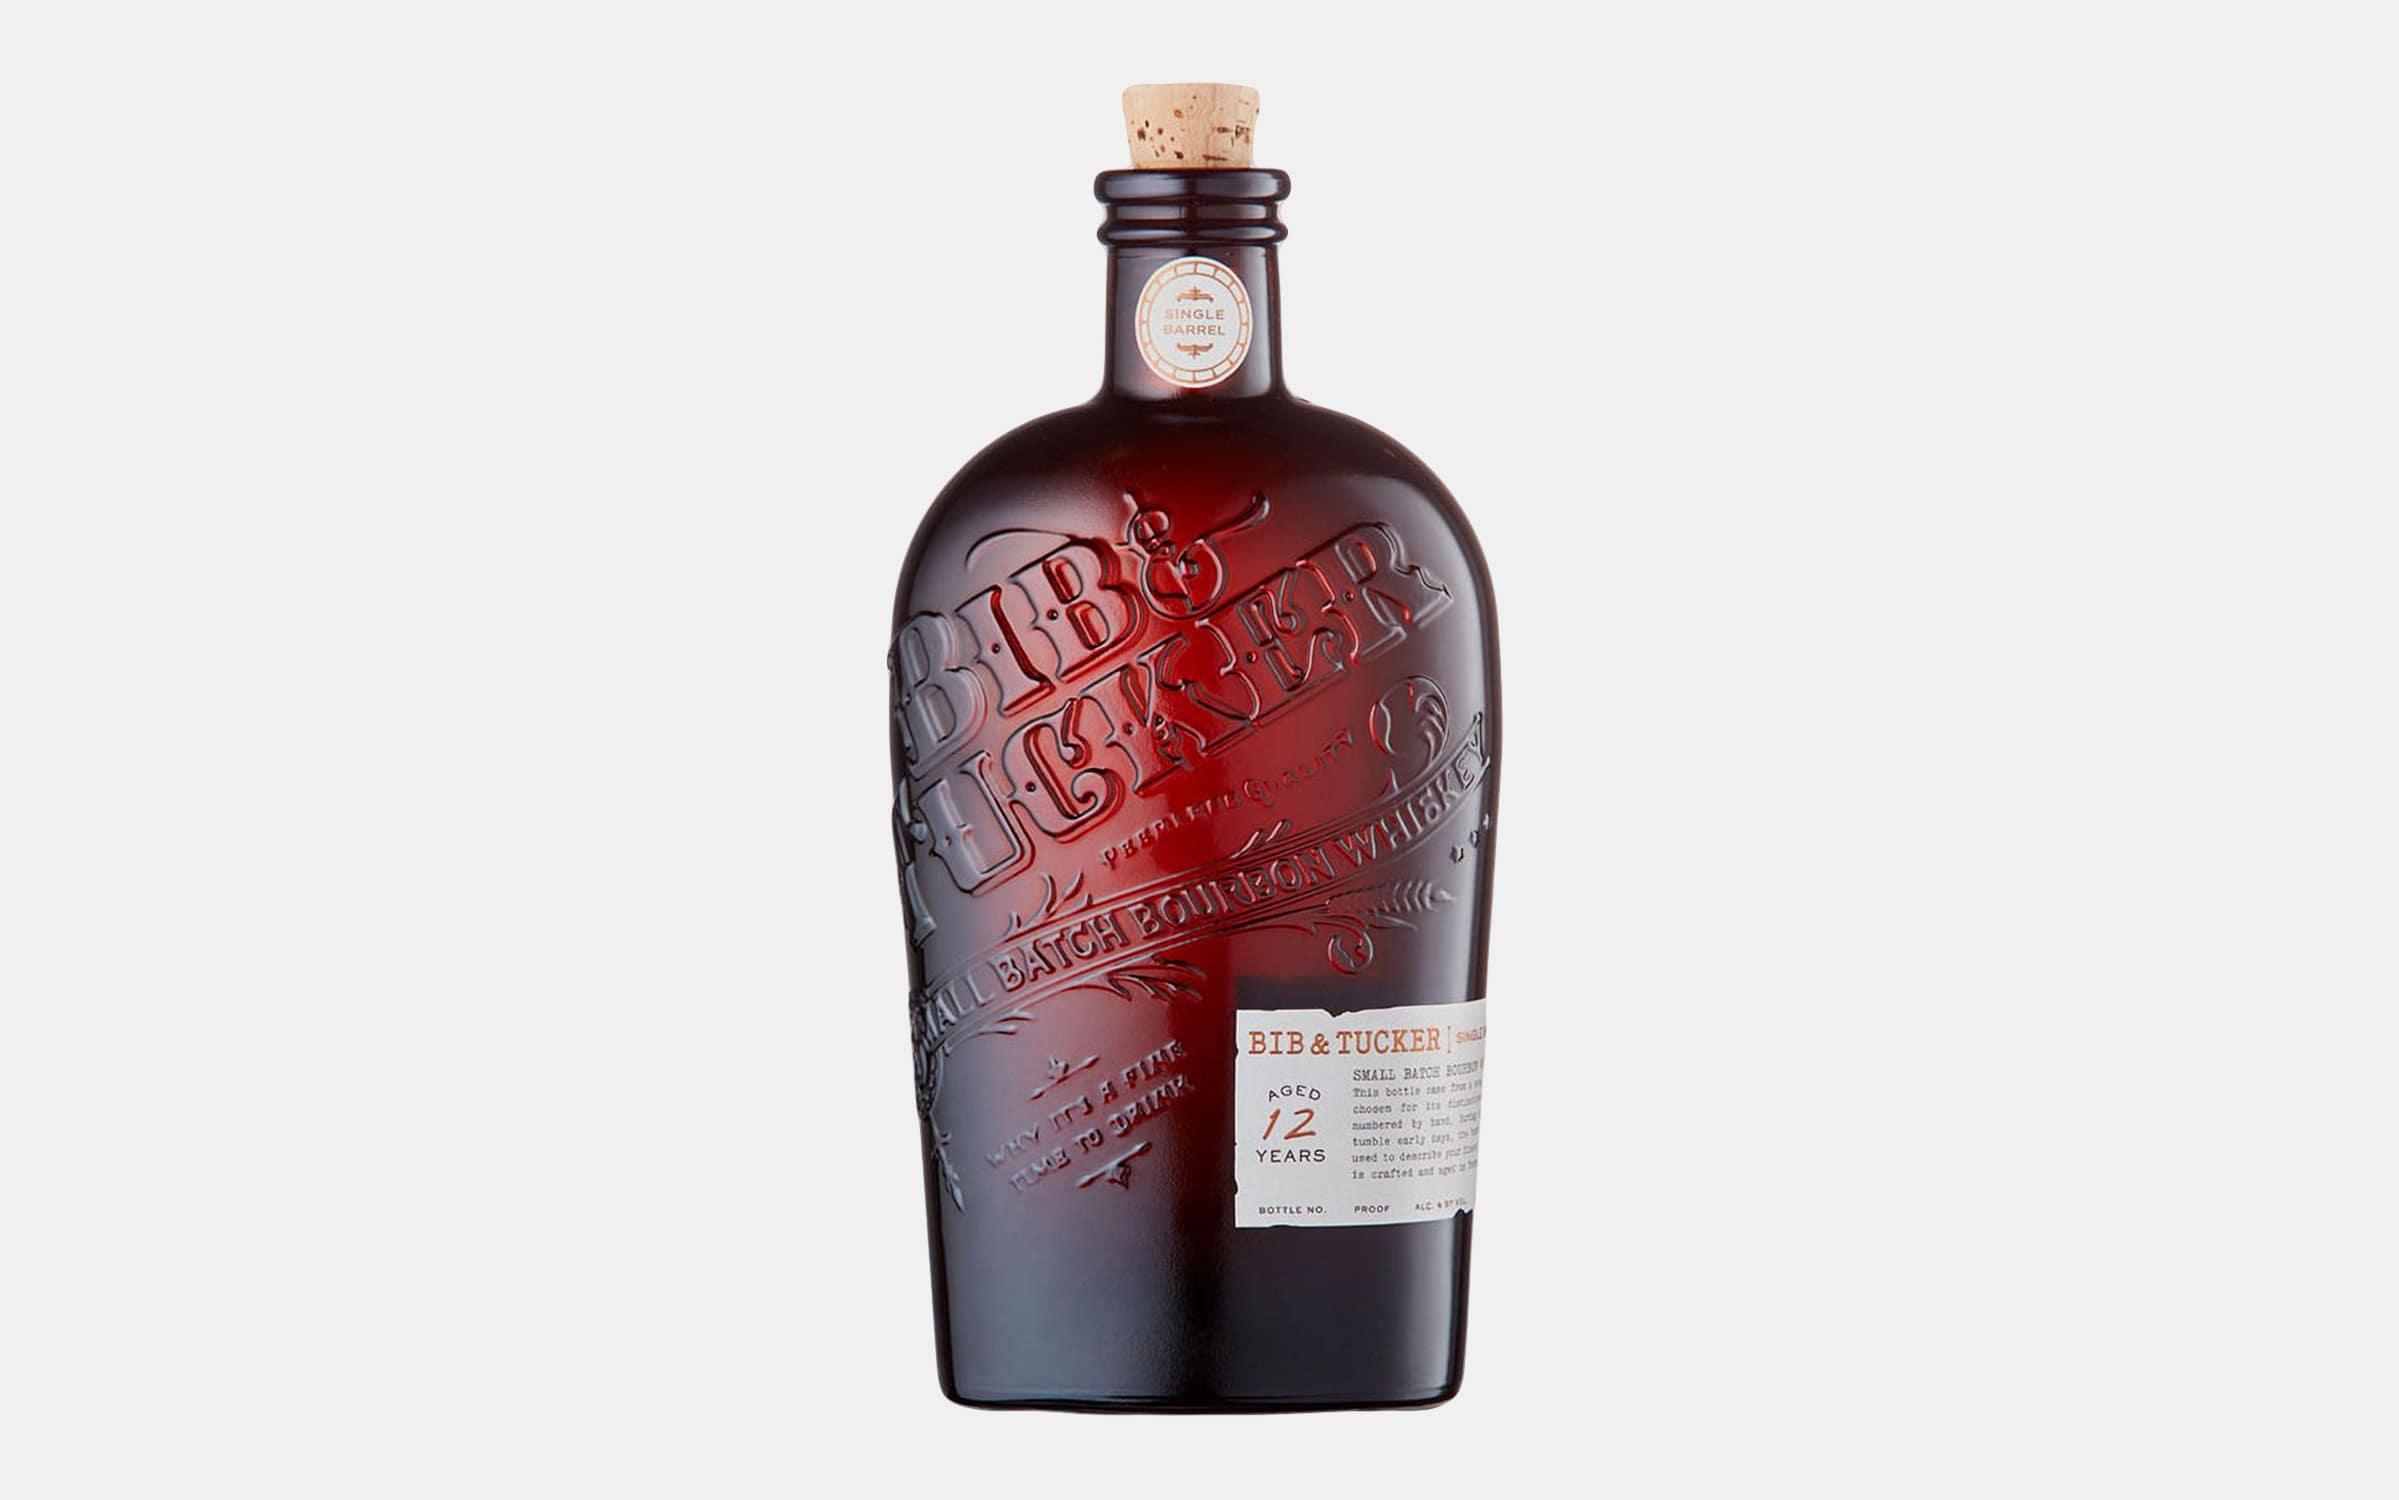 BIB & TUCKER 12-Year-Old Single Barrel Select Bourbon